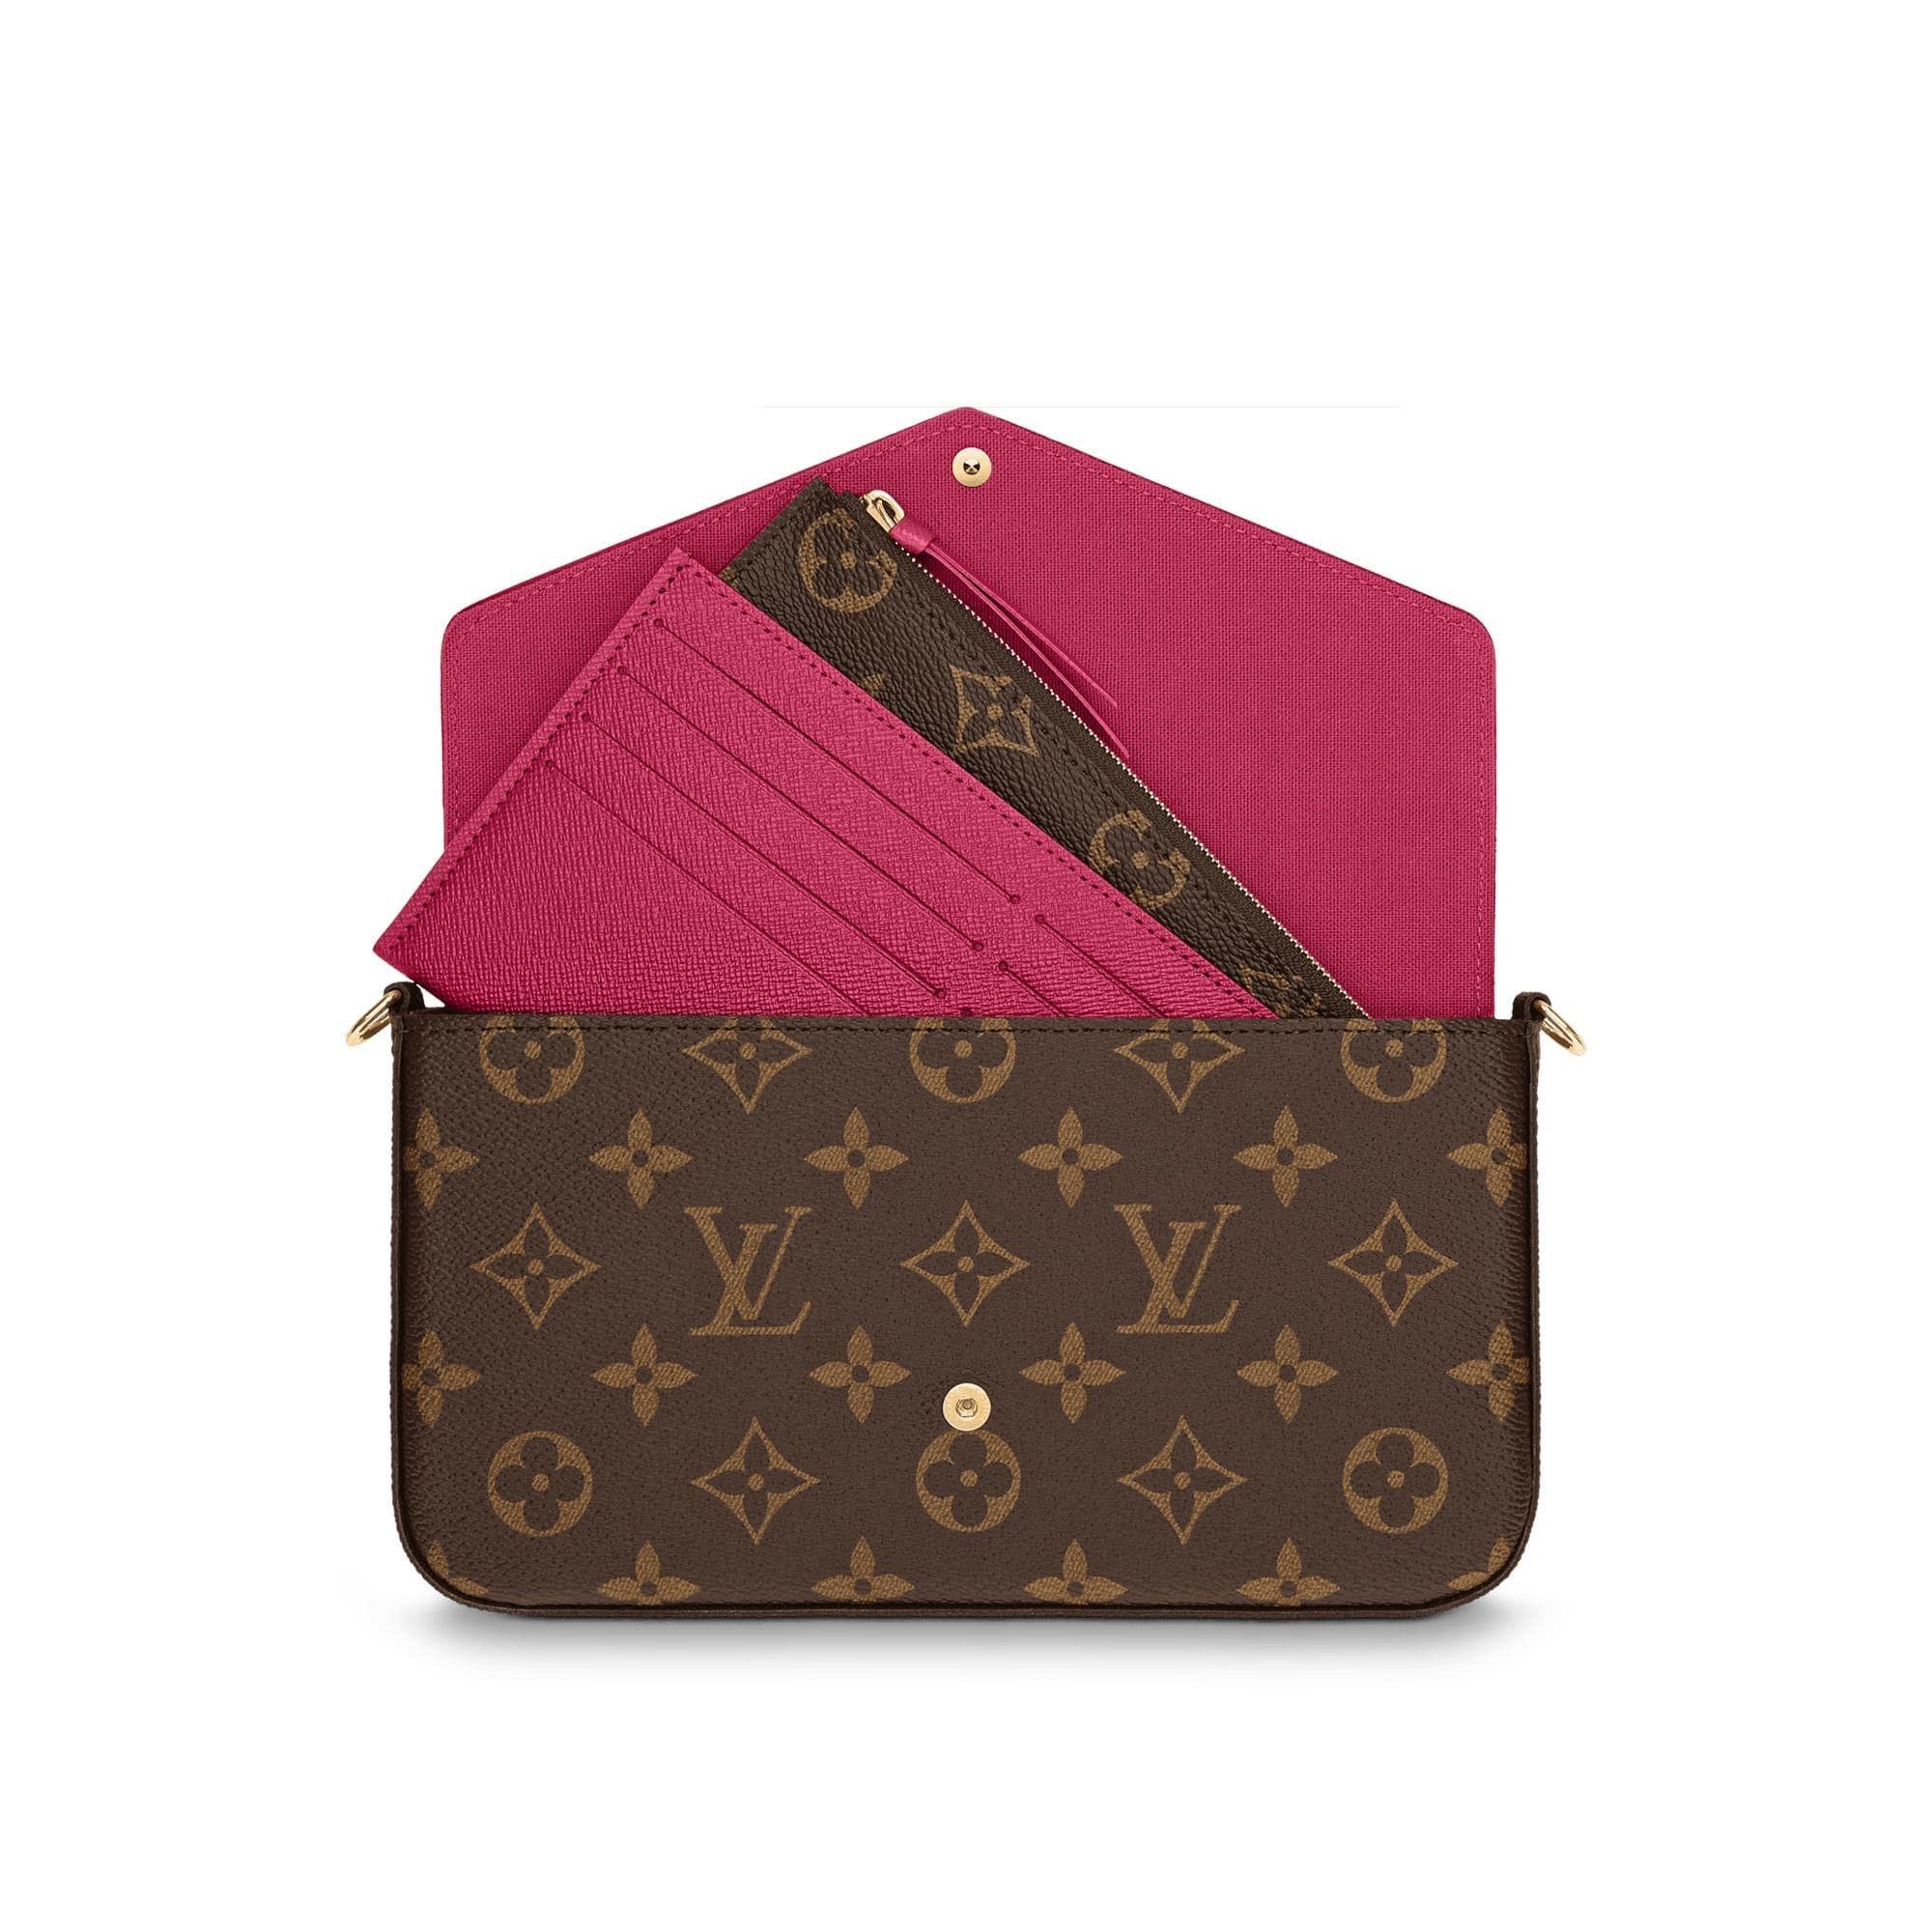 Louis Vuitton Pochette Felicie Monogram (With Accessories) Fuchsia